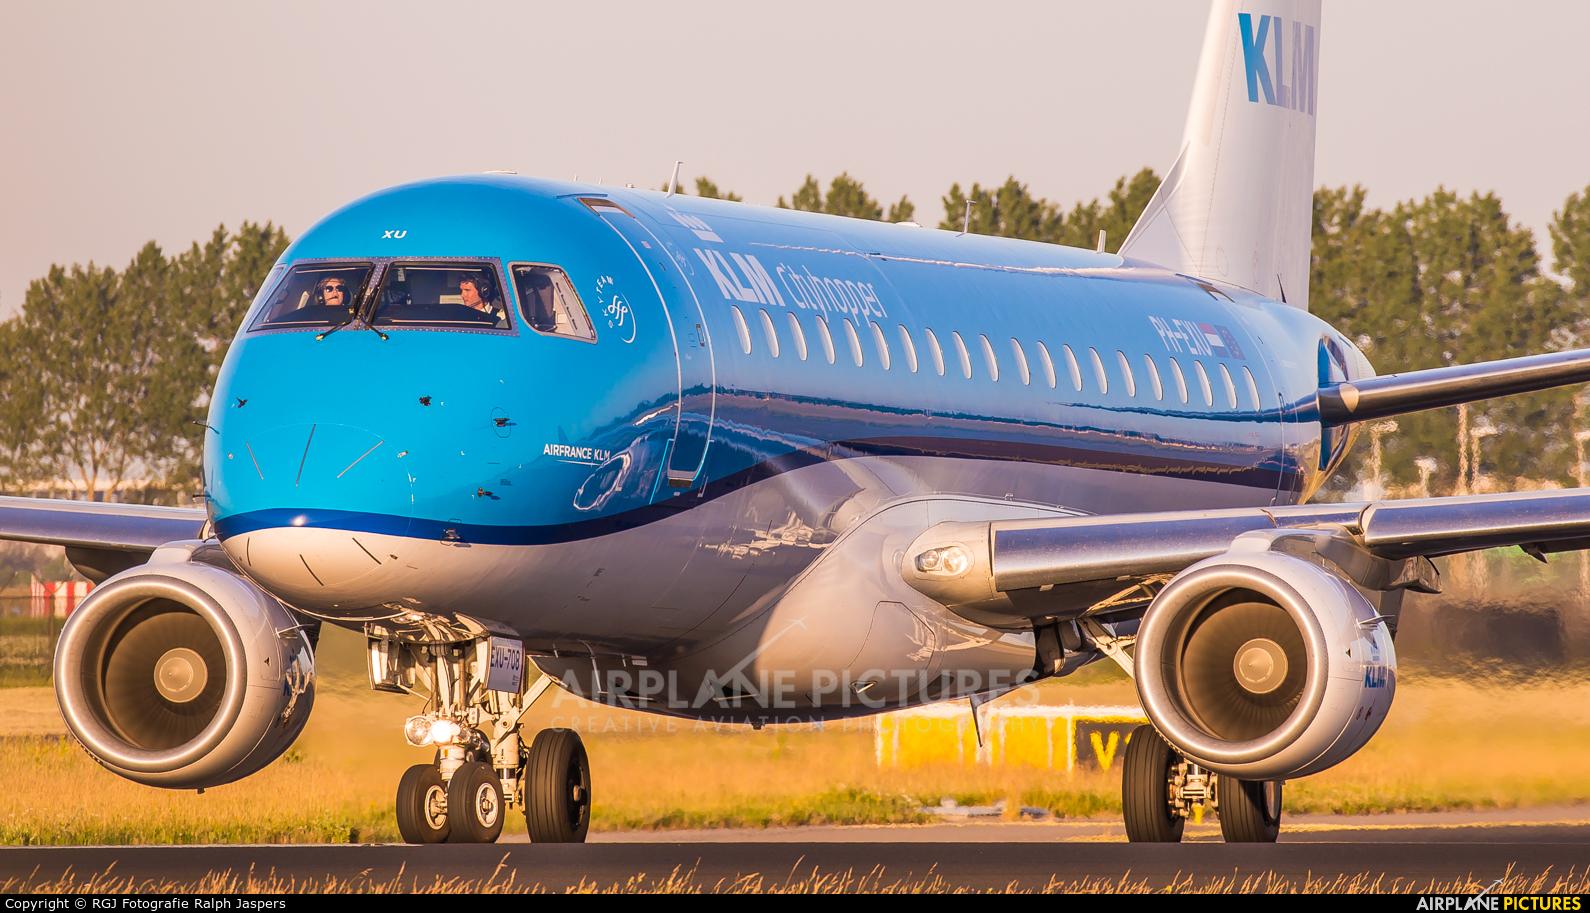 KLM Cityhopper PH-EXU aircraft at Amsterdam - Schiphol